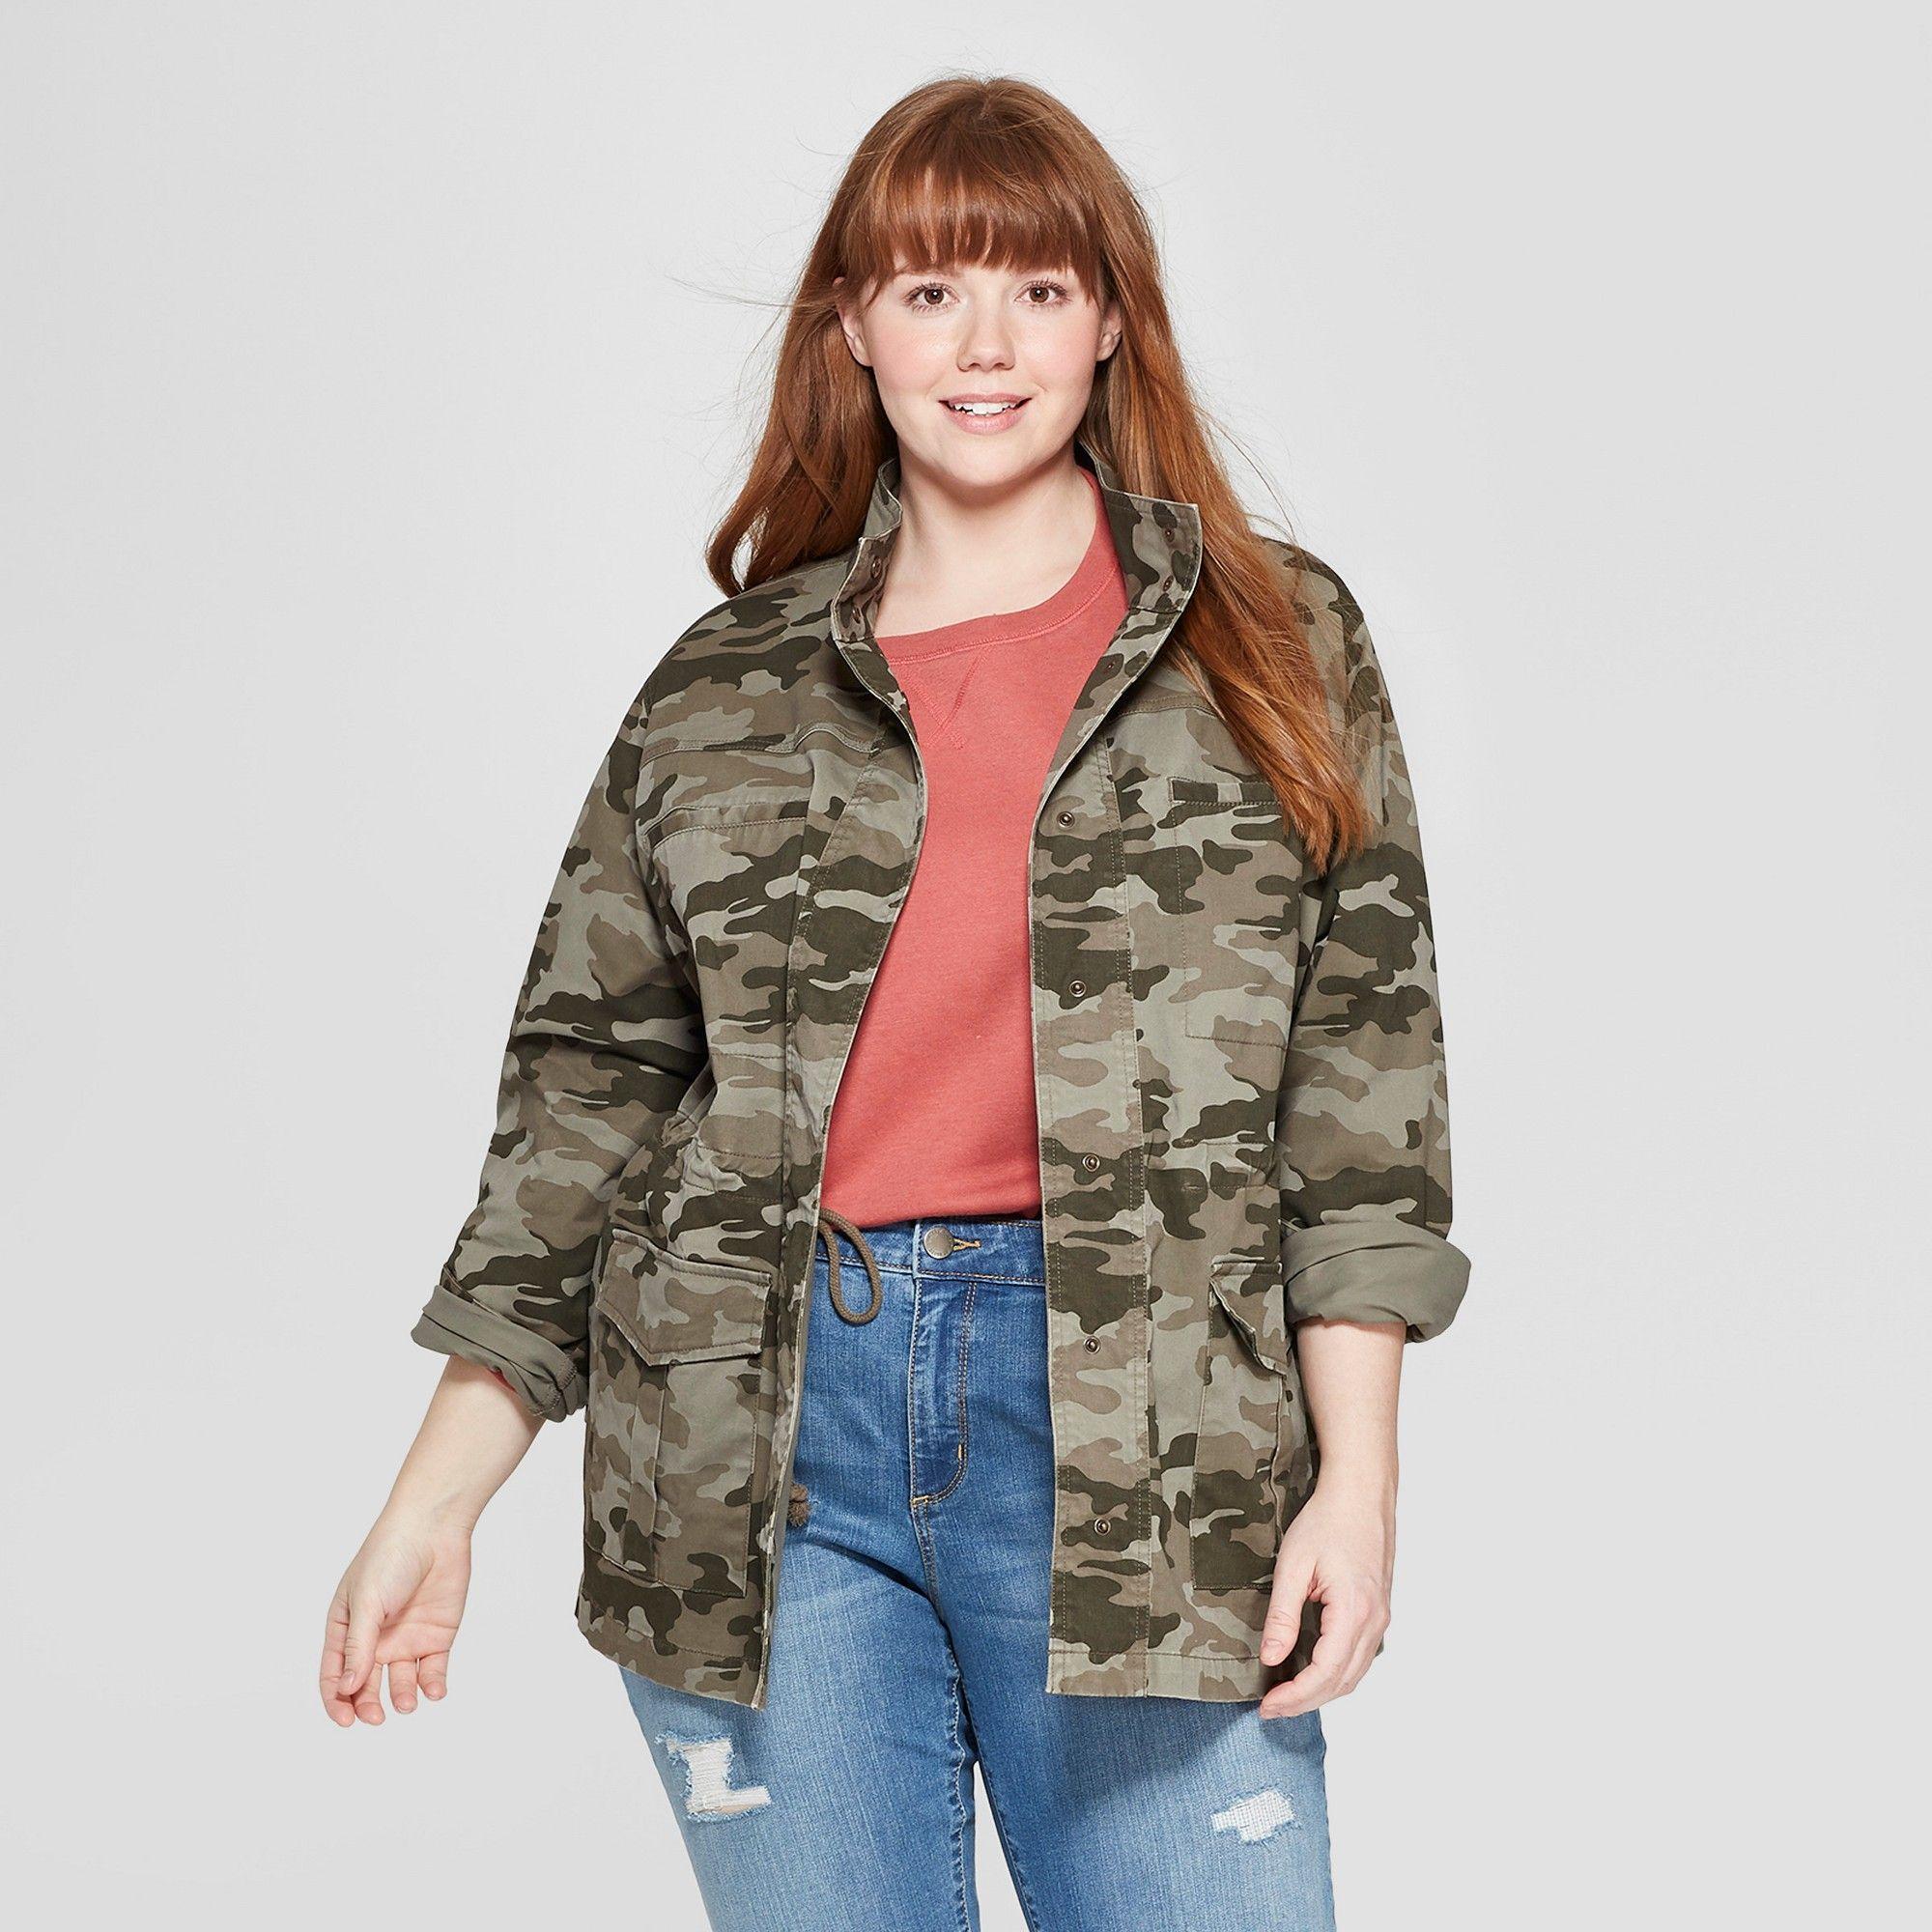 b82e7dd544 Women s Plus Size Long Sleeve Utility Jacket - Universal Thread Green 2X